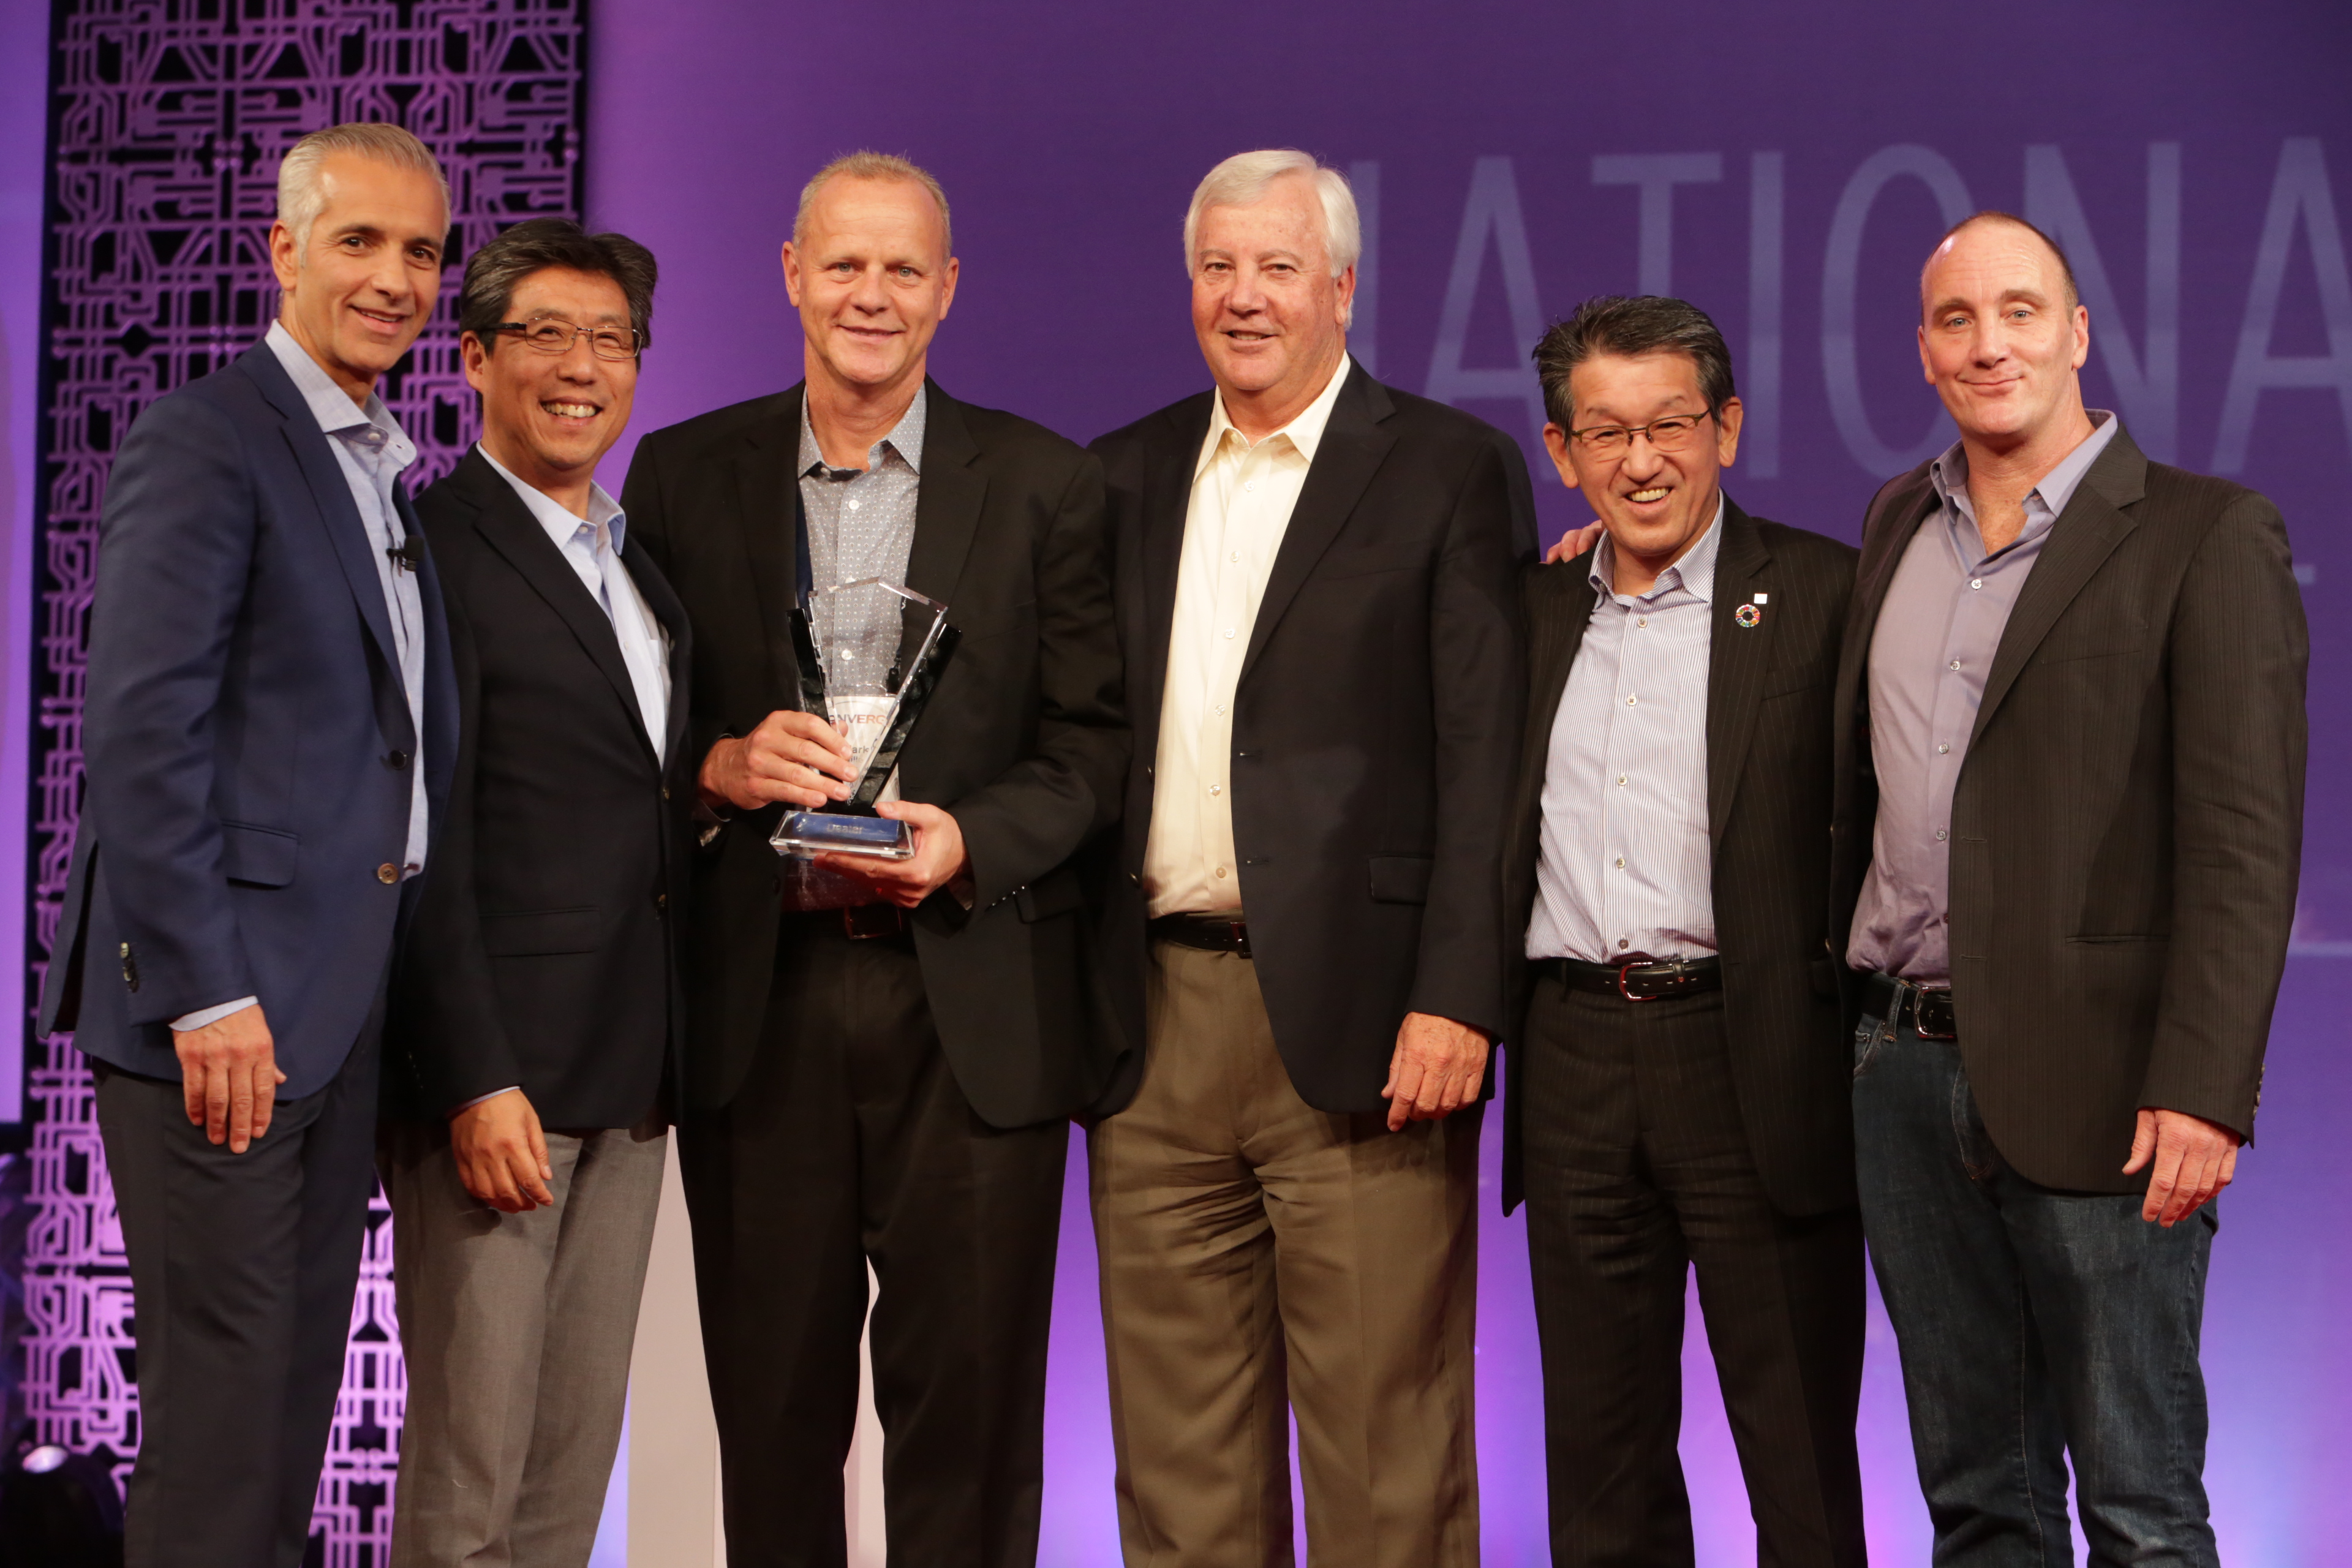 Eakes Awarded at Ricoh Dealer Conference